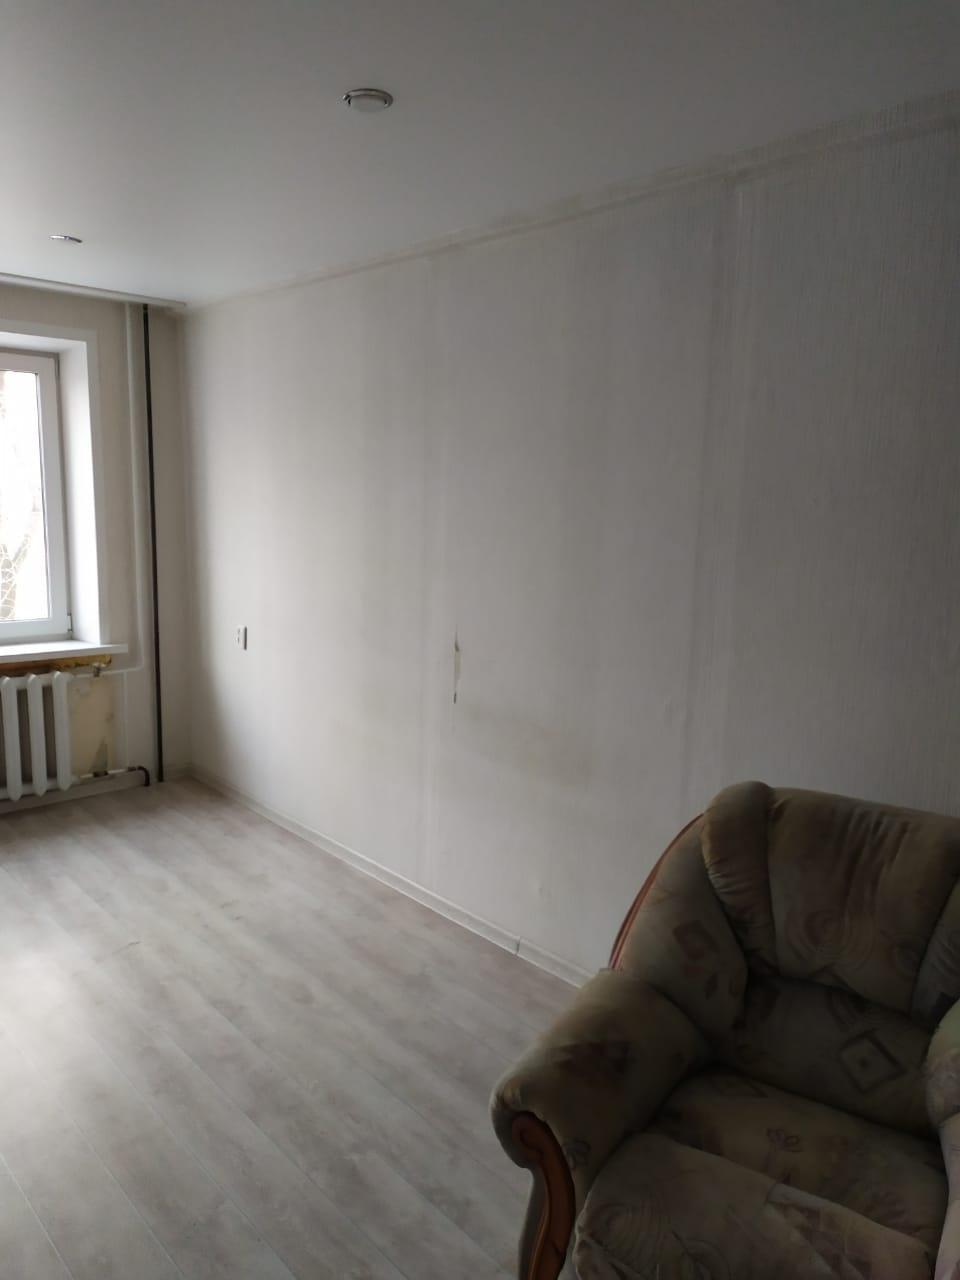 3к квартира улица Гастелло, 32 | 16000 | аренда в Красноярске фото 4